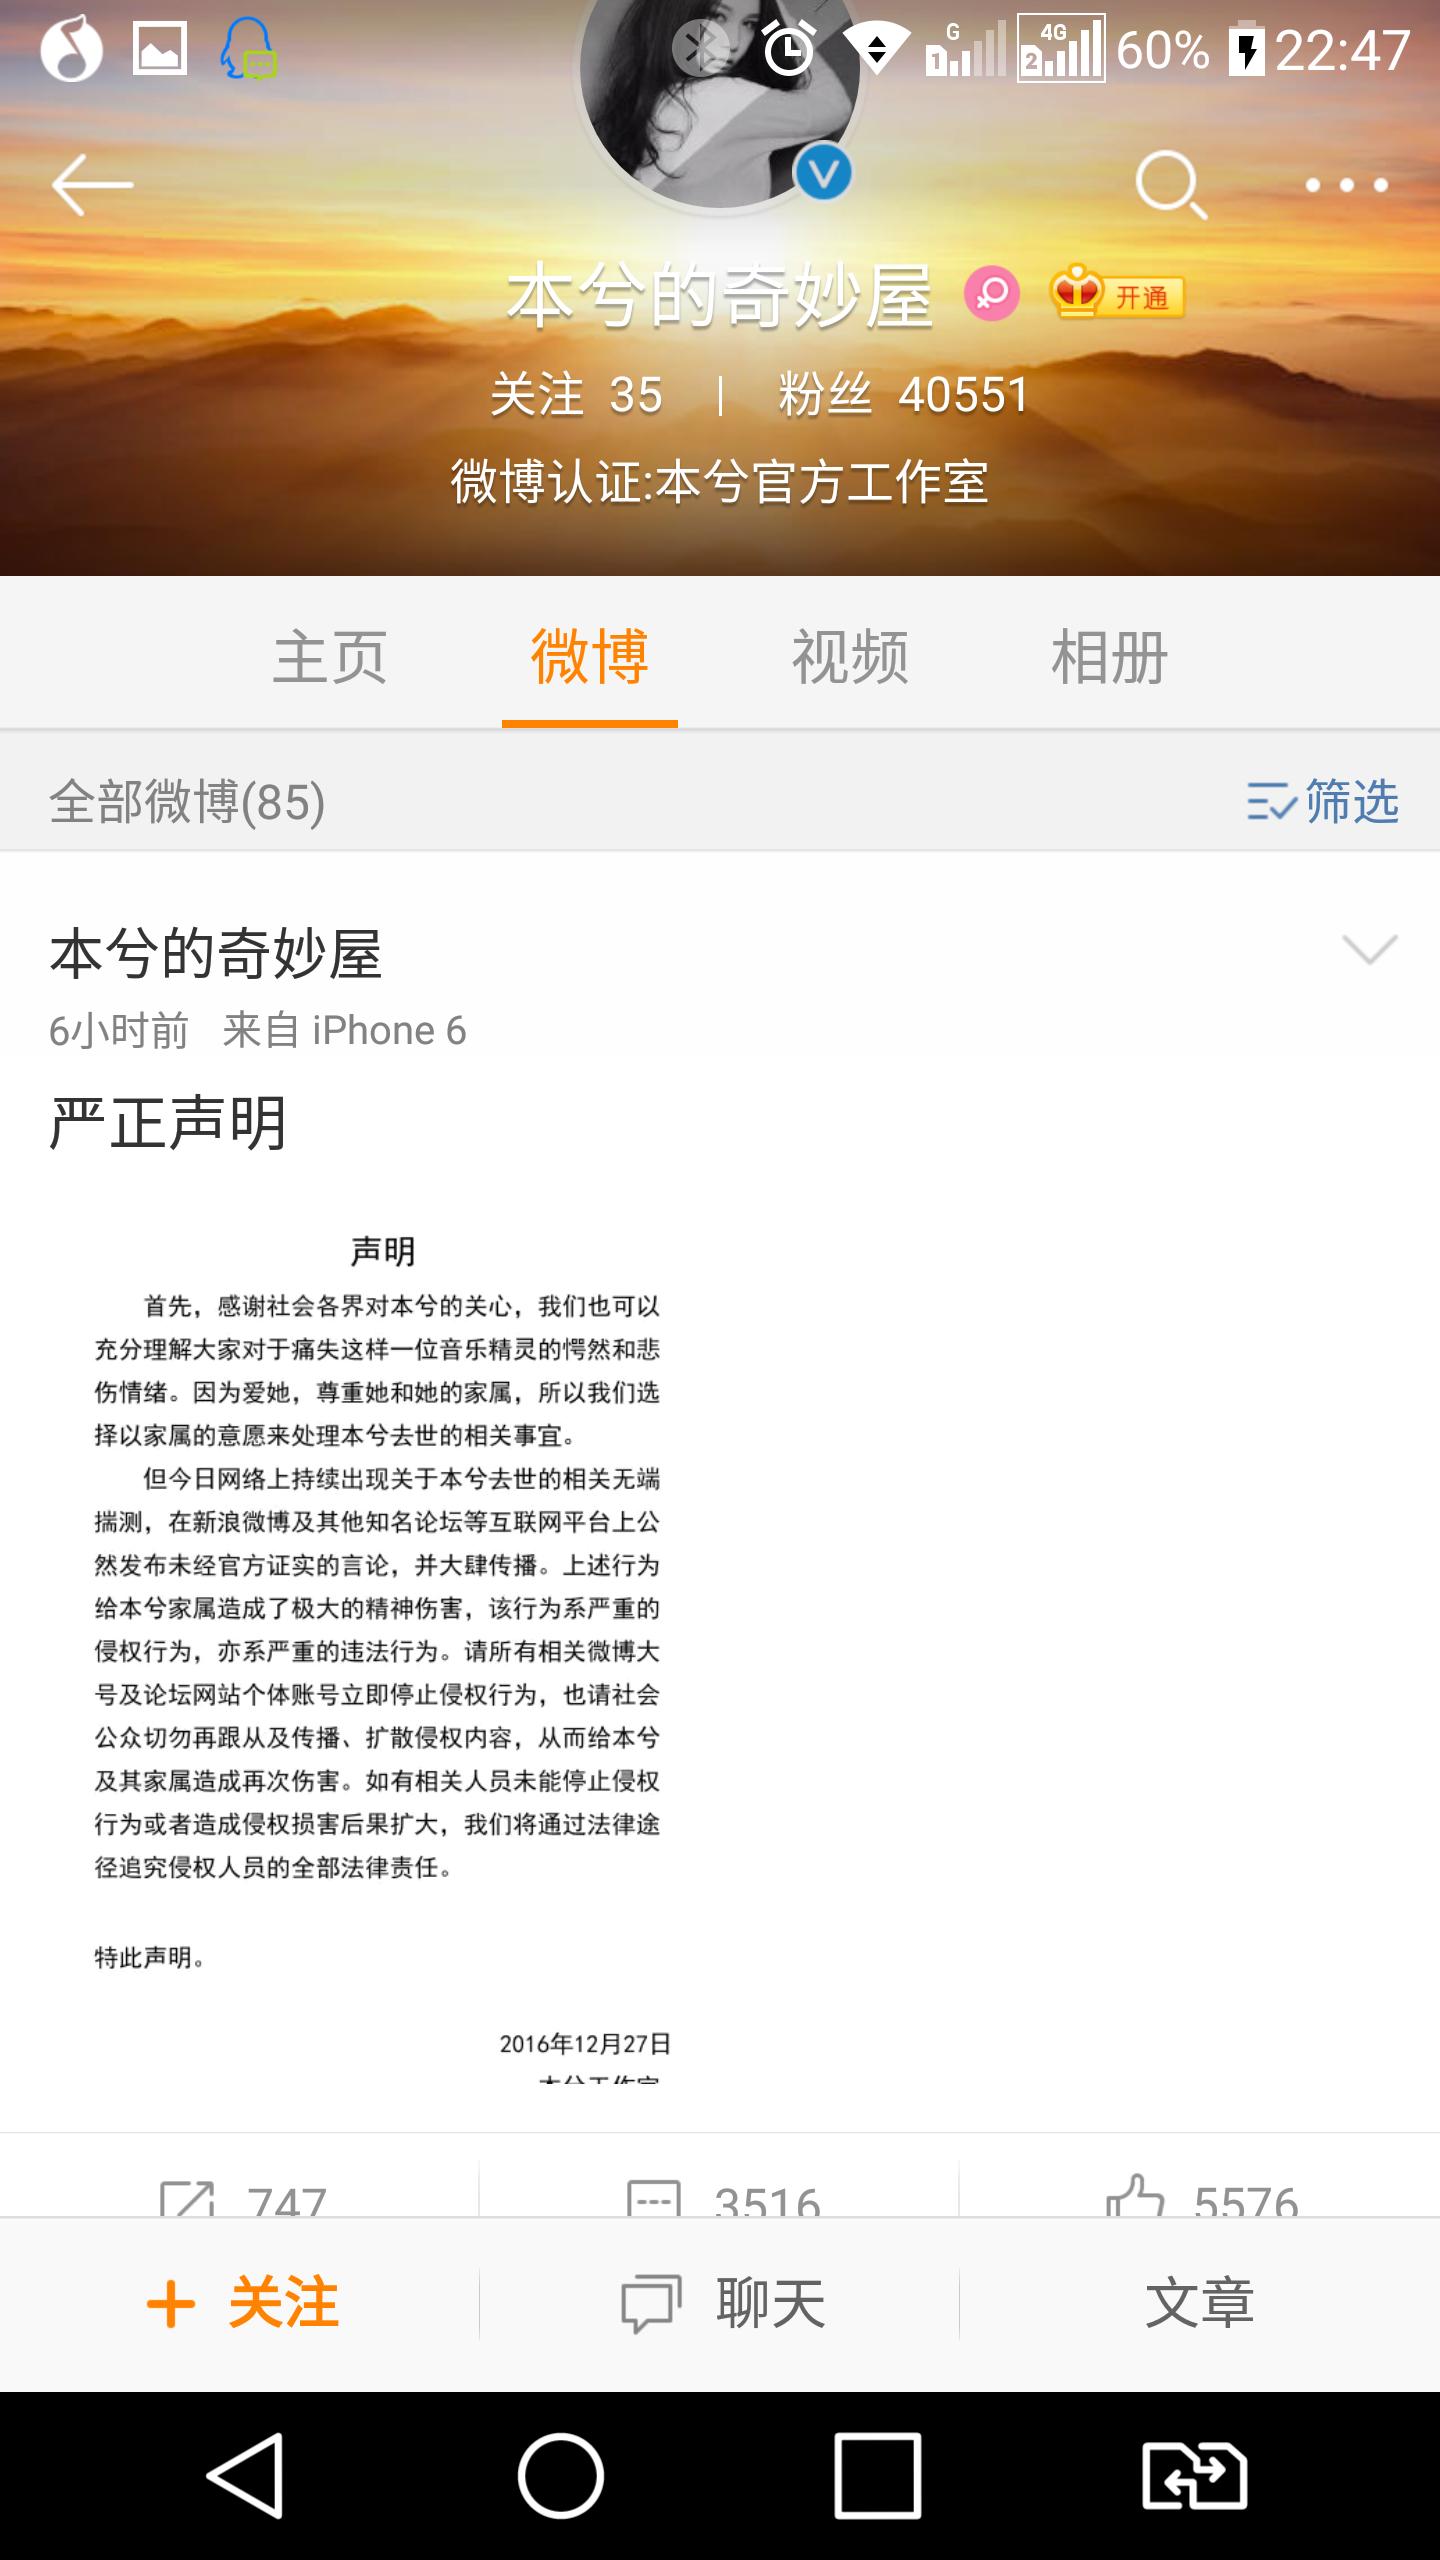 screenshot_2016-12-27-22-47-34